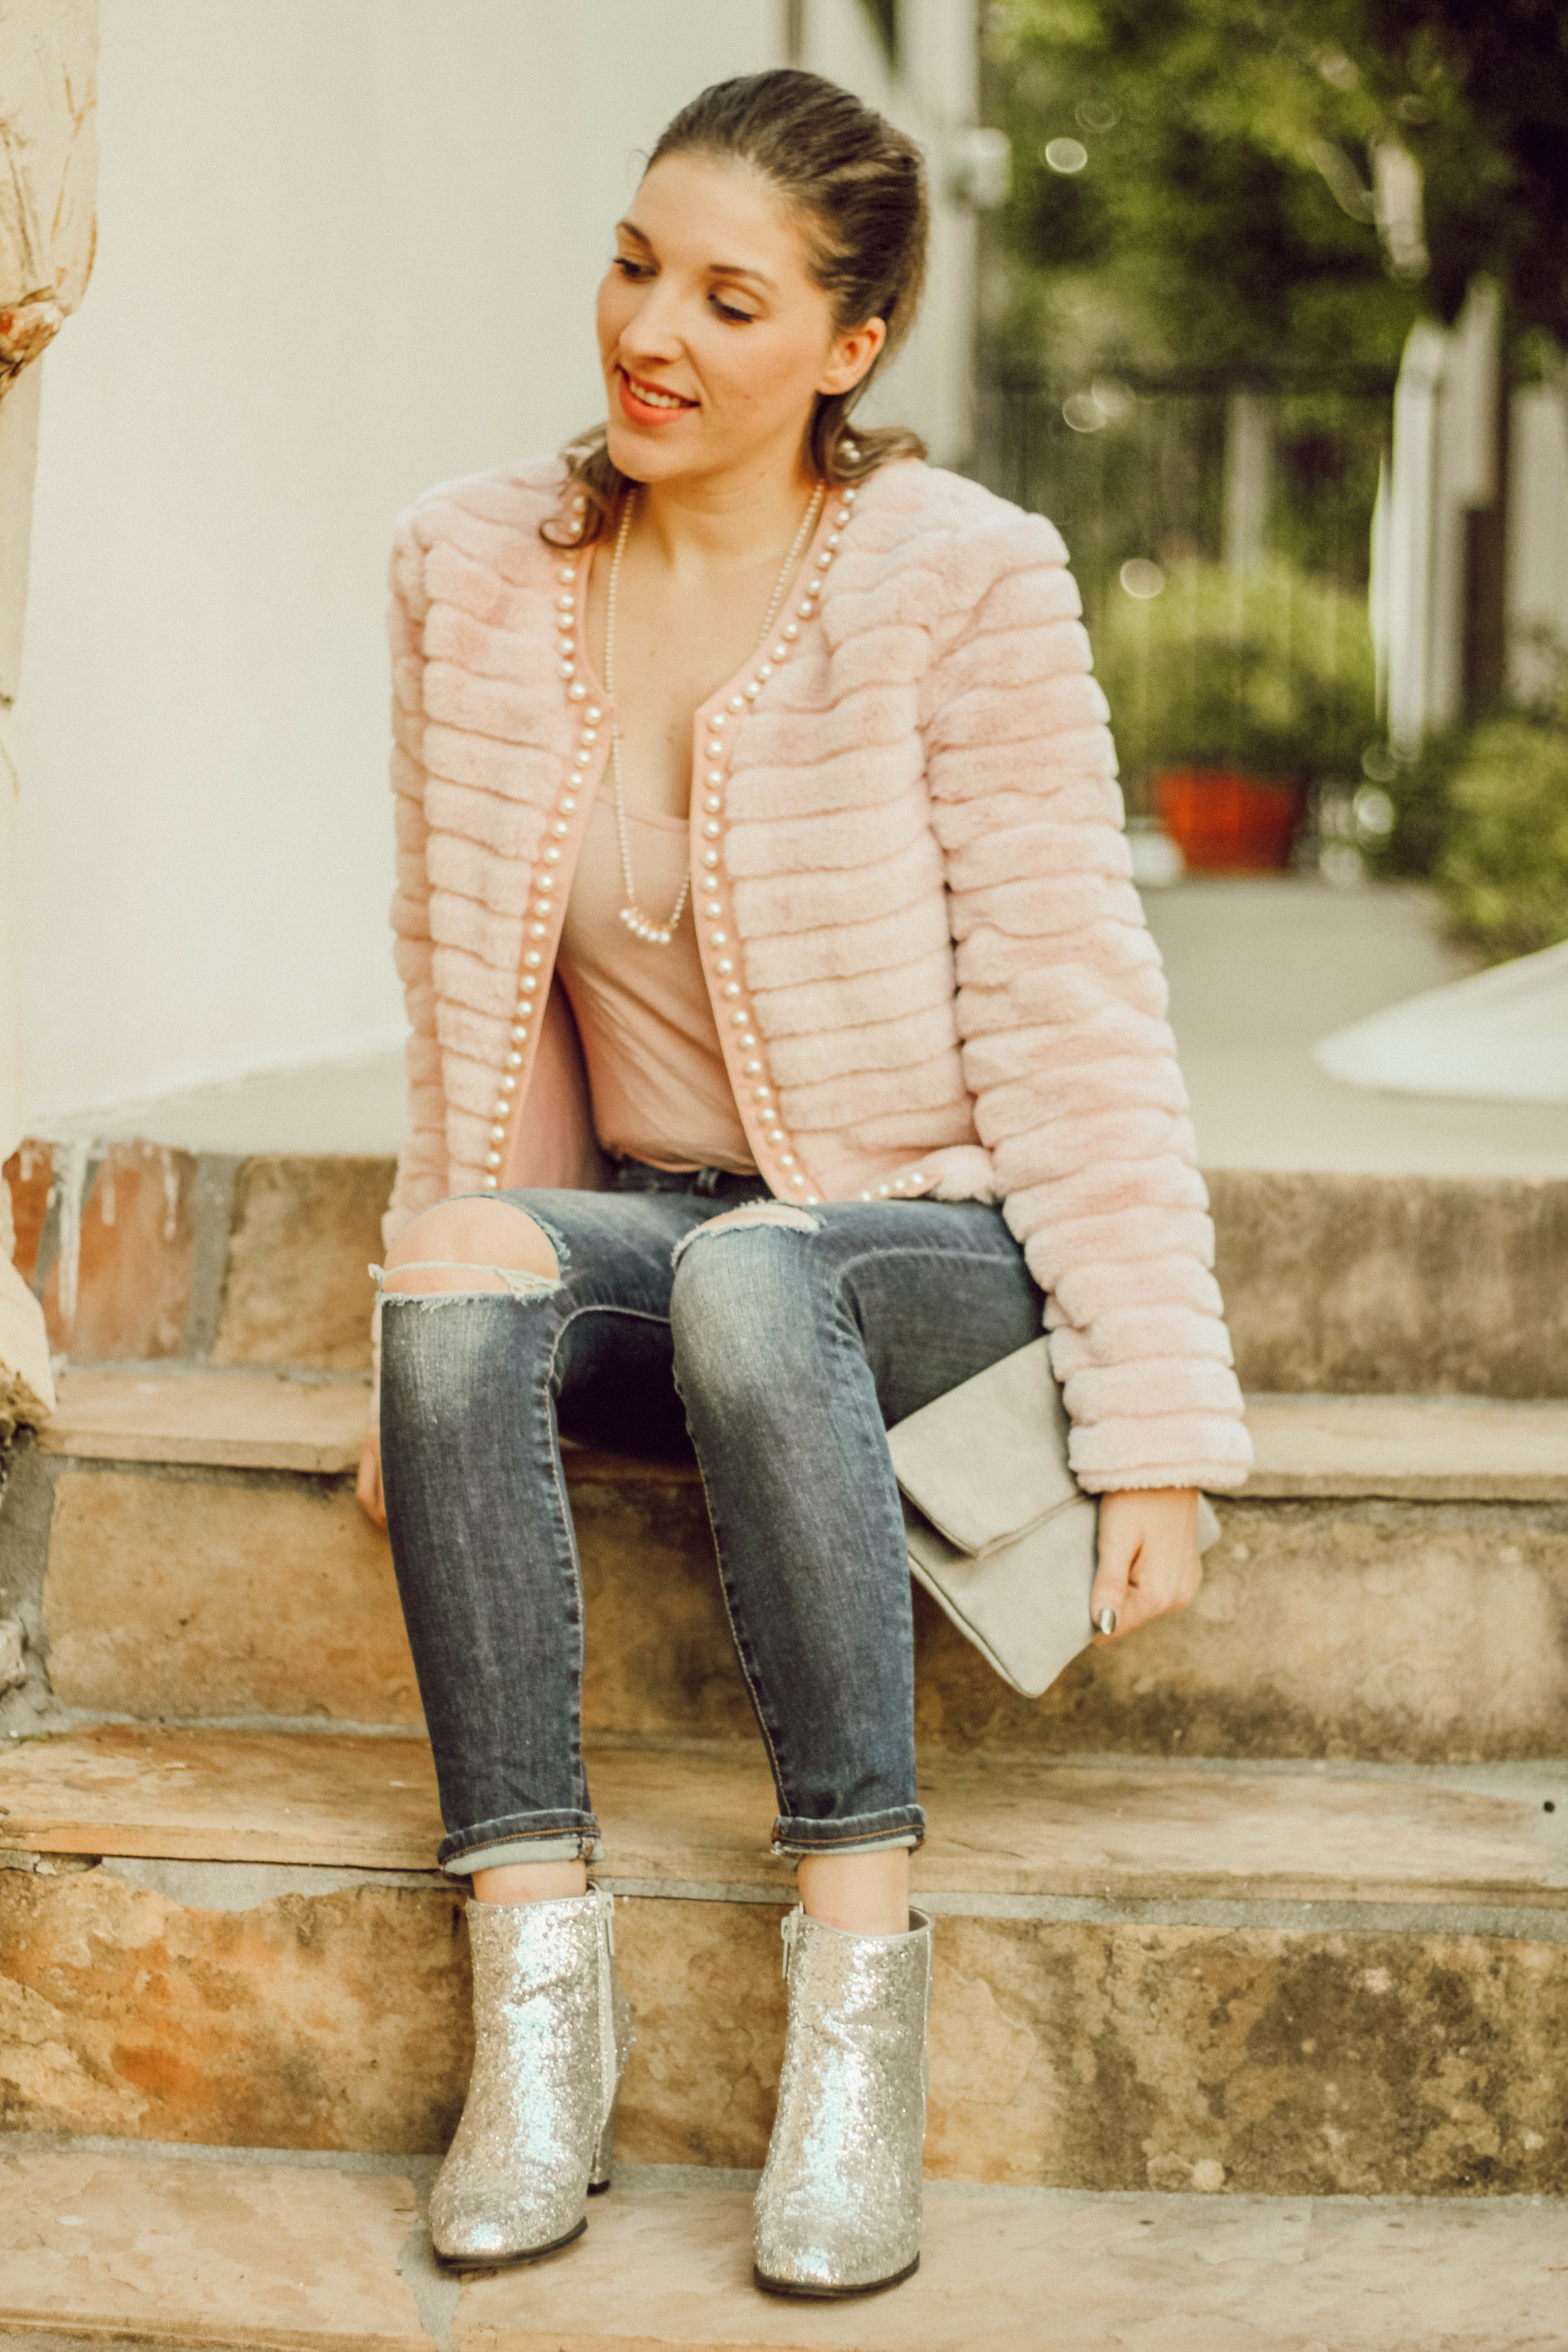 Coat:   Shein   // Jeans:   BR   // Top:   Asos   // Boots: similar   here   // Purse: similar   here   // Necklace: similar   here